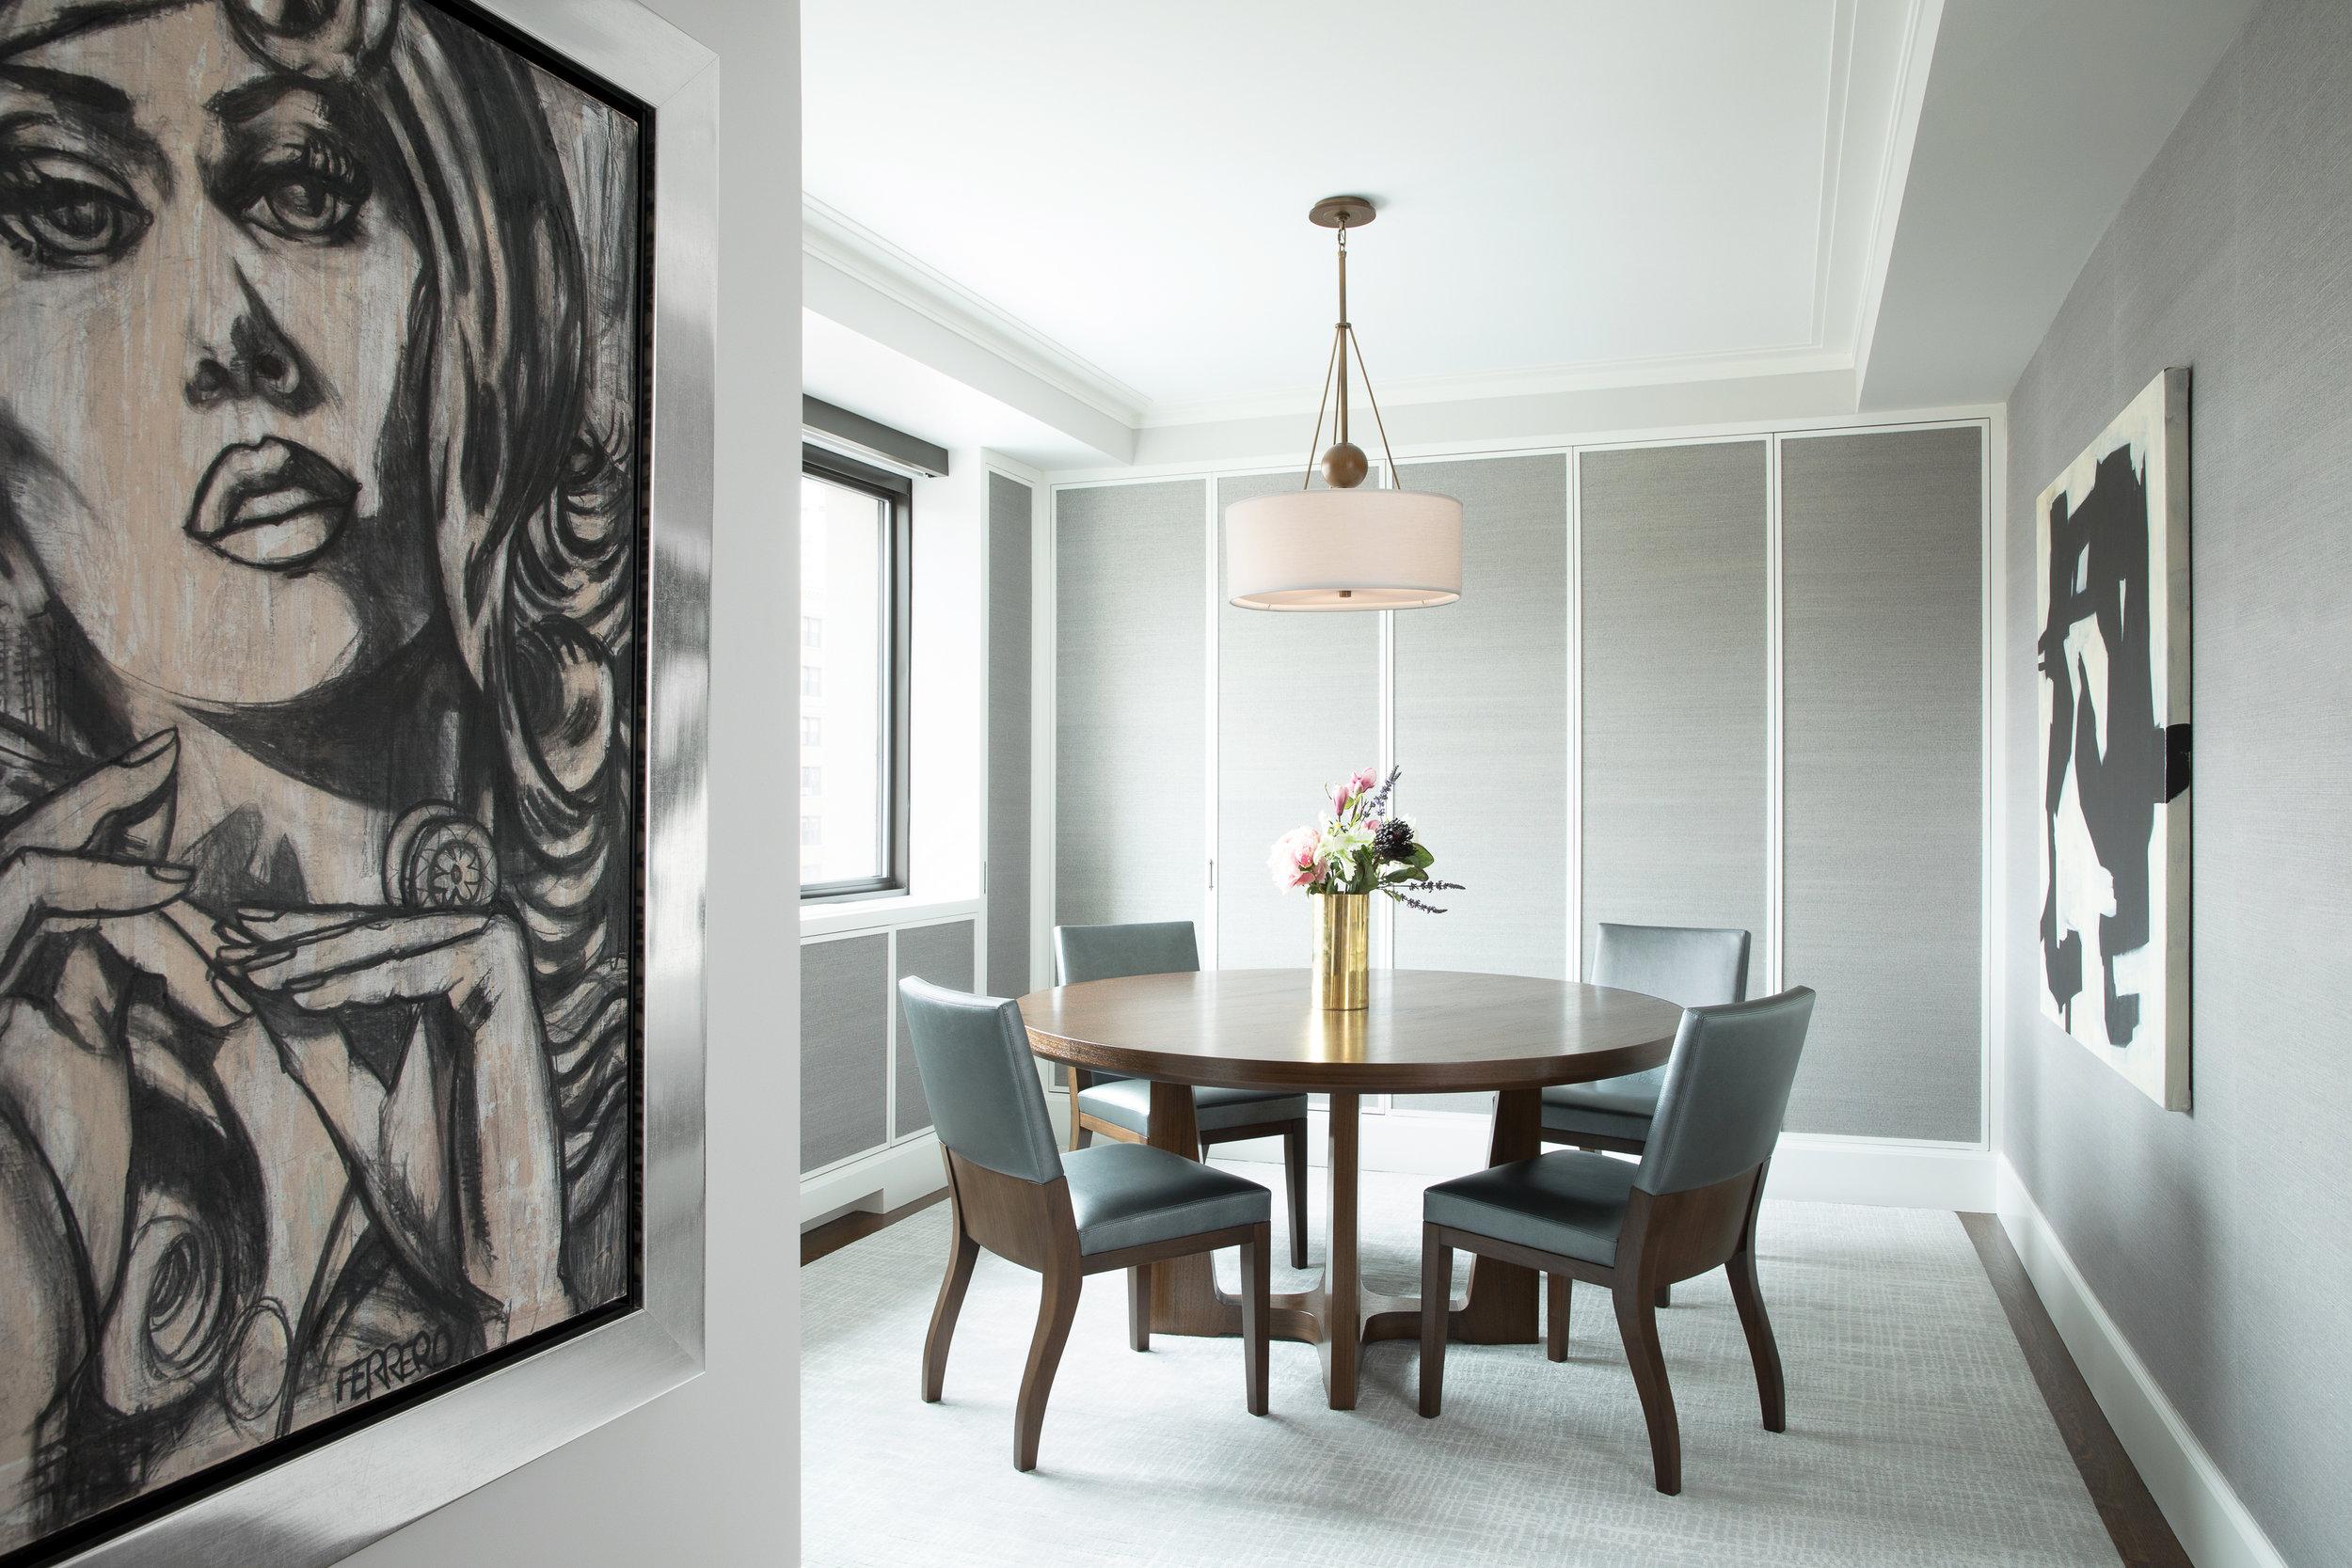 108-prewar-apartment-renovation-dining-room